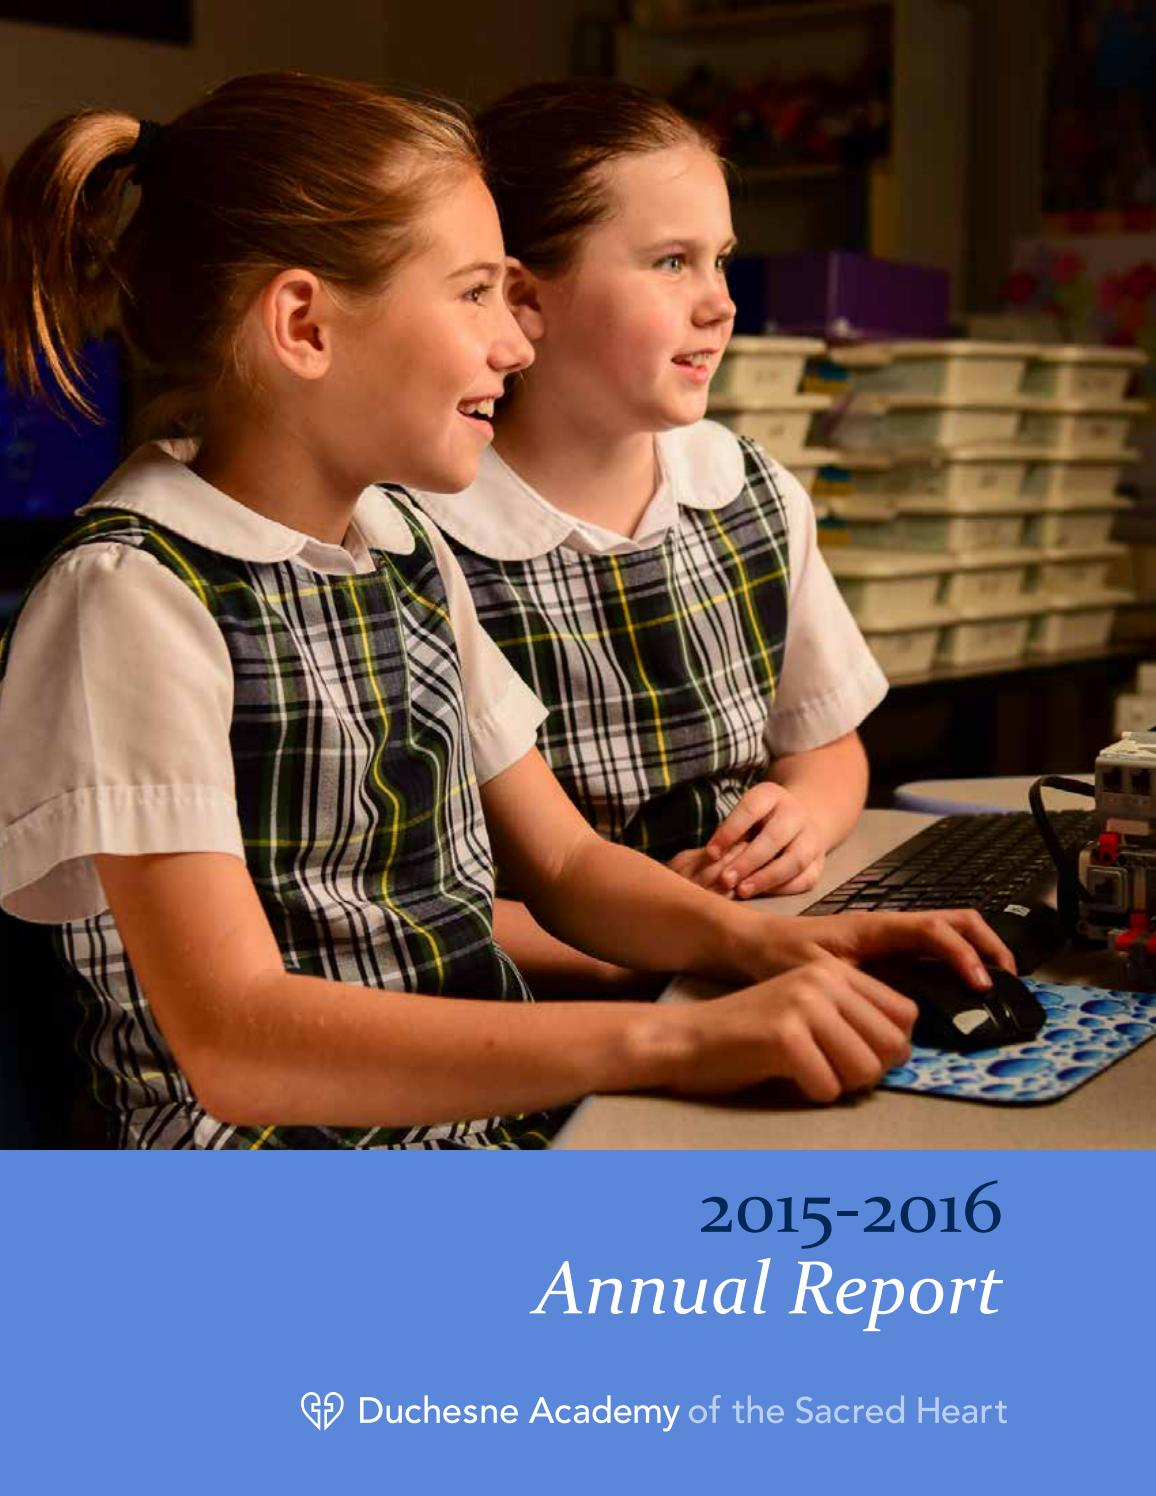 duchesne academy annual report by duchesne academy issuu 2015 2016 duchesne annual report